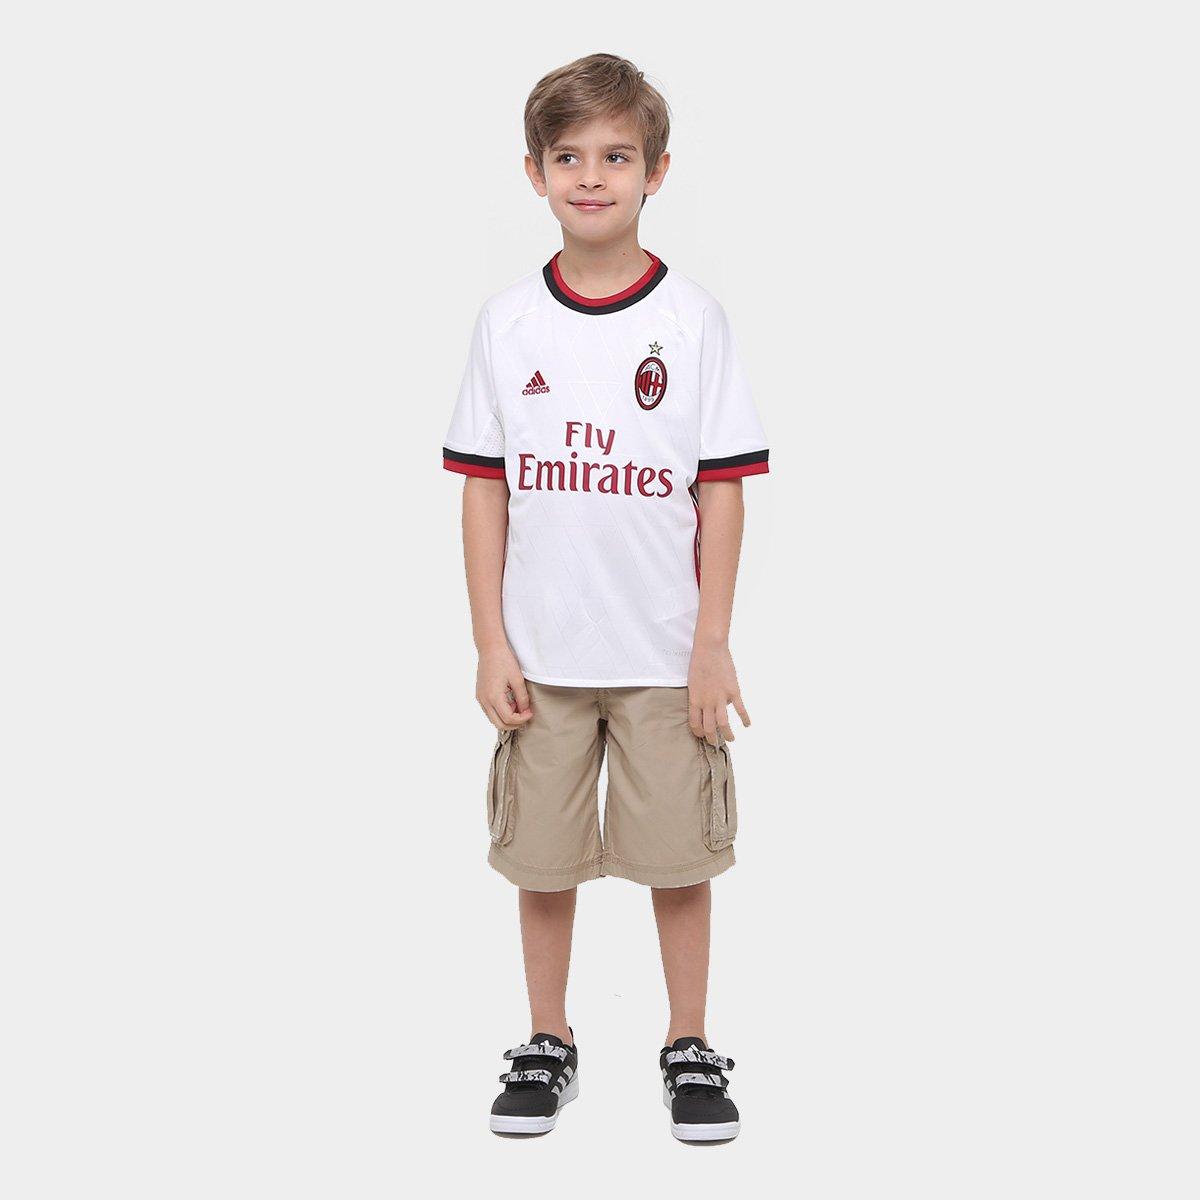 Adidas Milan 17 Camisa 18 Infantil Branco s Vermelho e Away nº Torcedor Tdww8q